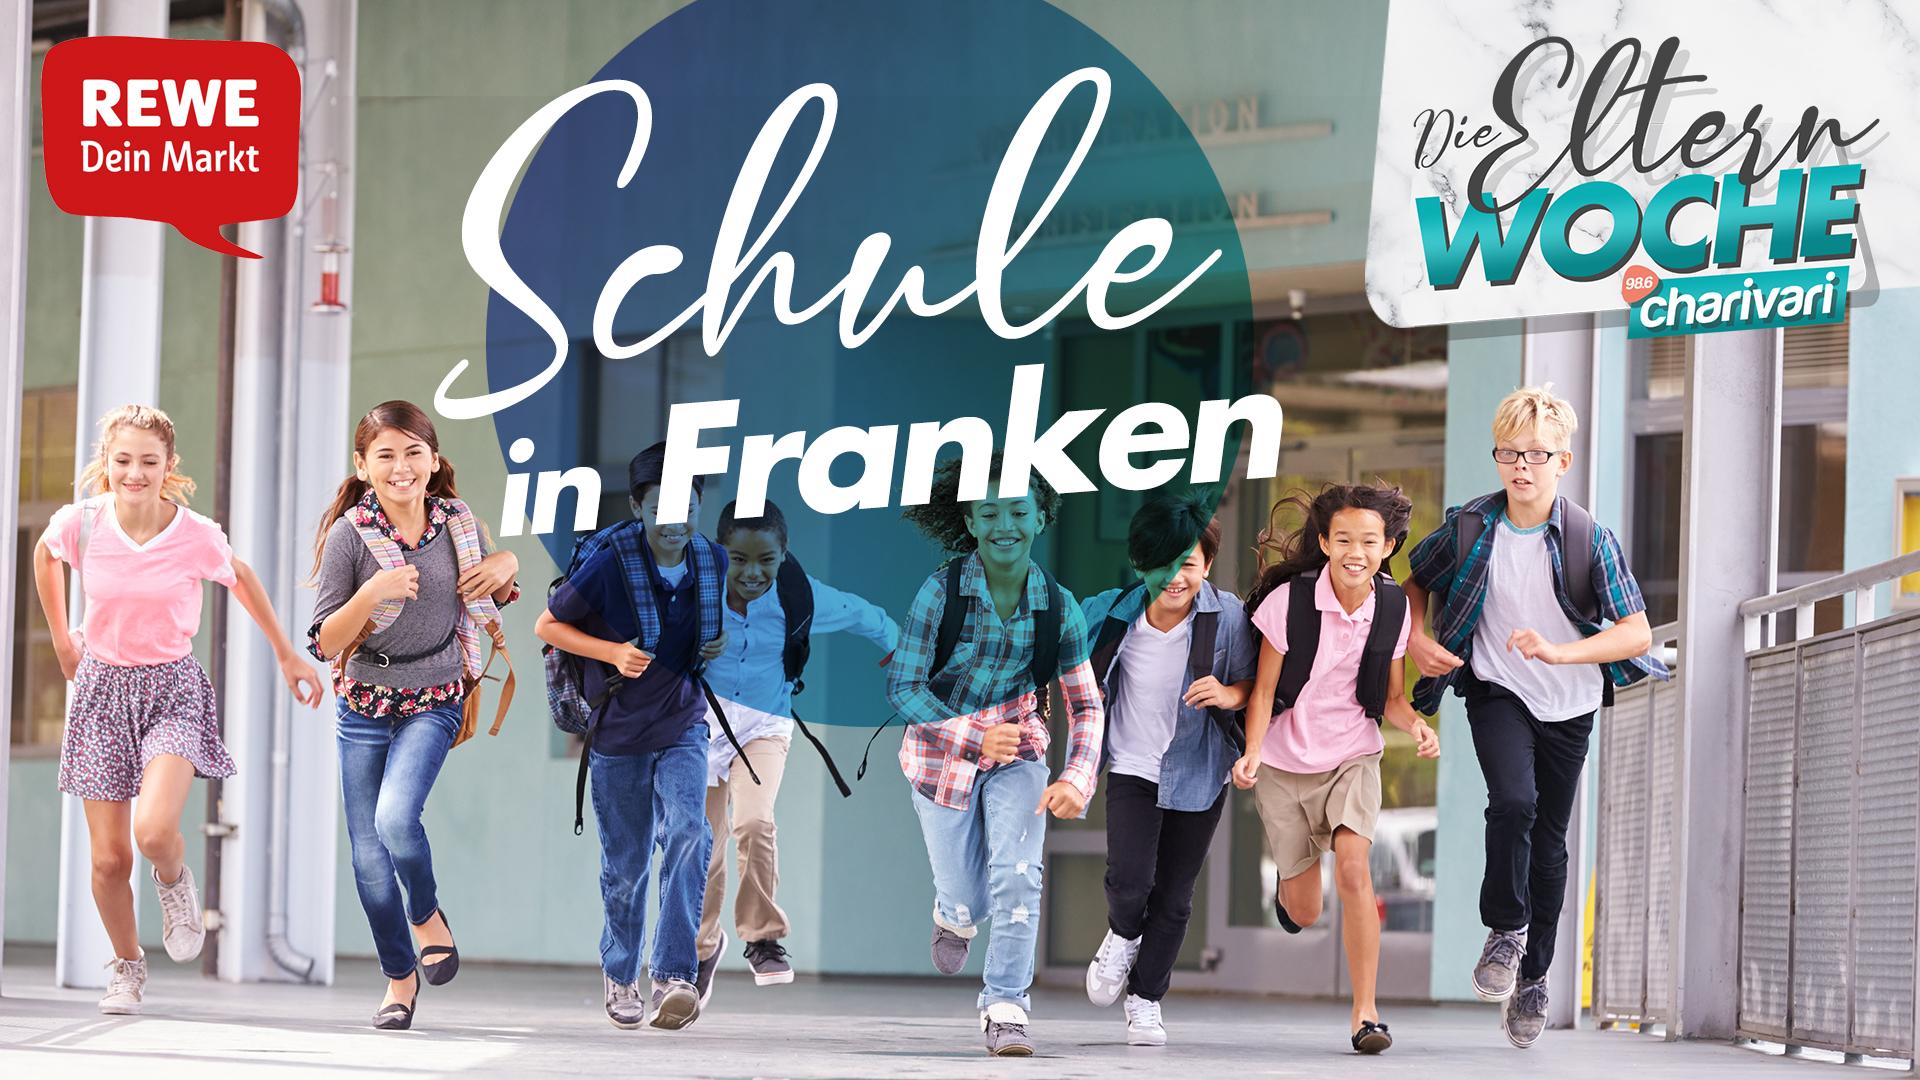 Die Elternwoche: Schule in Franken